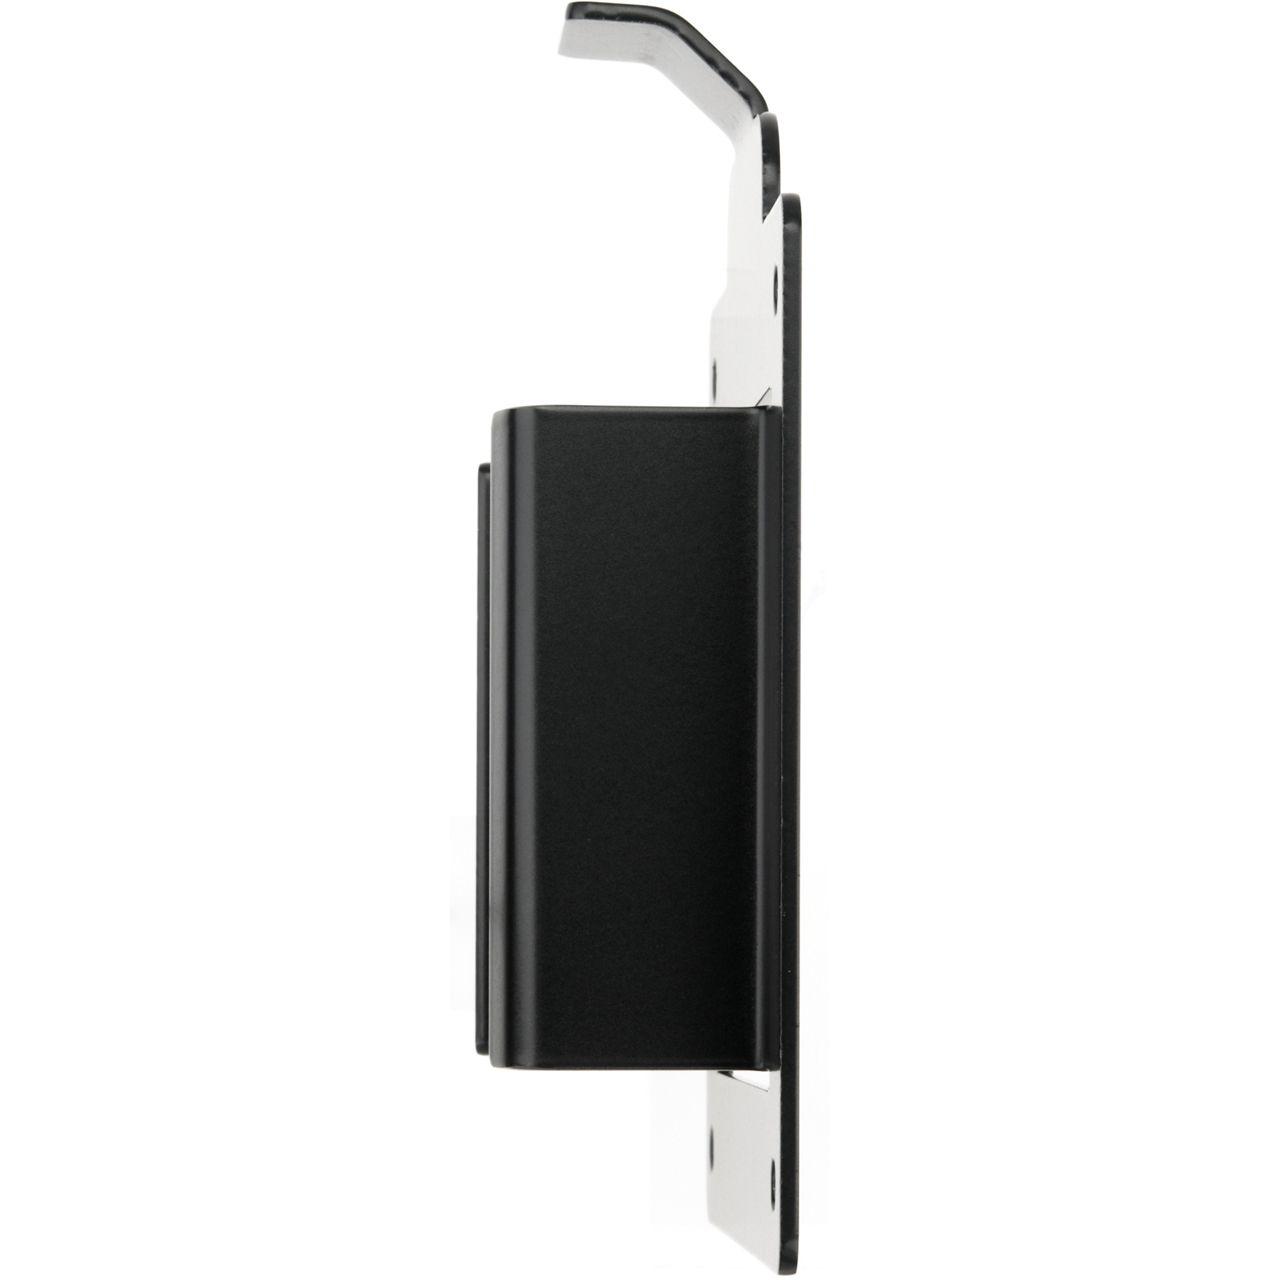 iiyama halterung f r mini pc md brpcv01 zubeh r f r monitore hardware. Black Bedroom Furniture Sets. Home Design Ideas